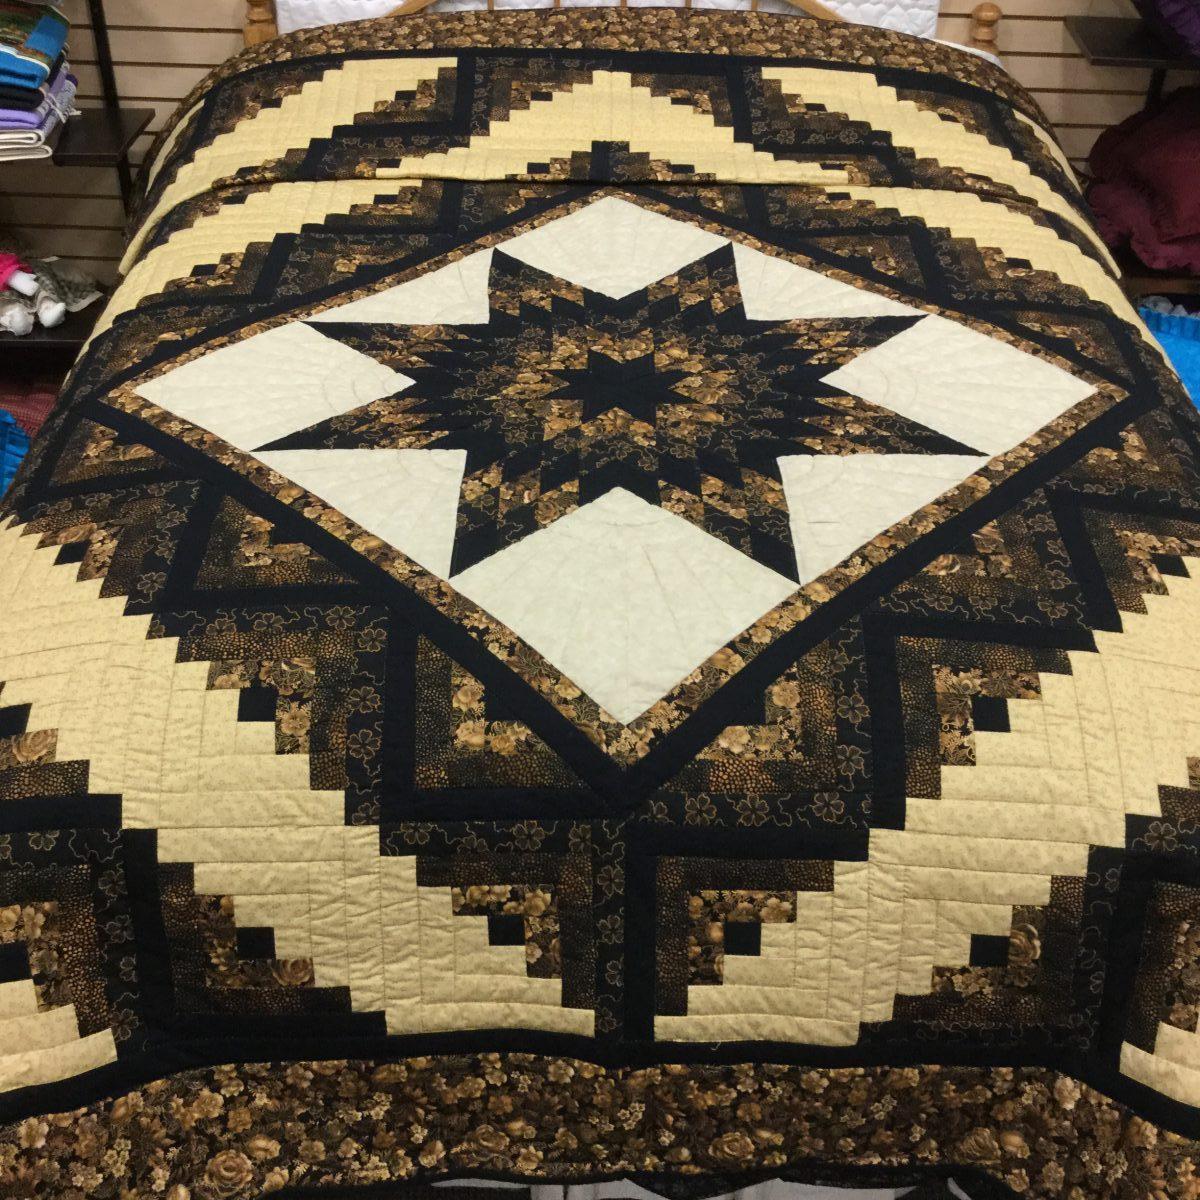 Log Cabin Lone Star Quilt Handmade by Amish | Family Farm Handcrafts : lone star log cabin quilt pattern - Adamdwight.com